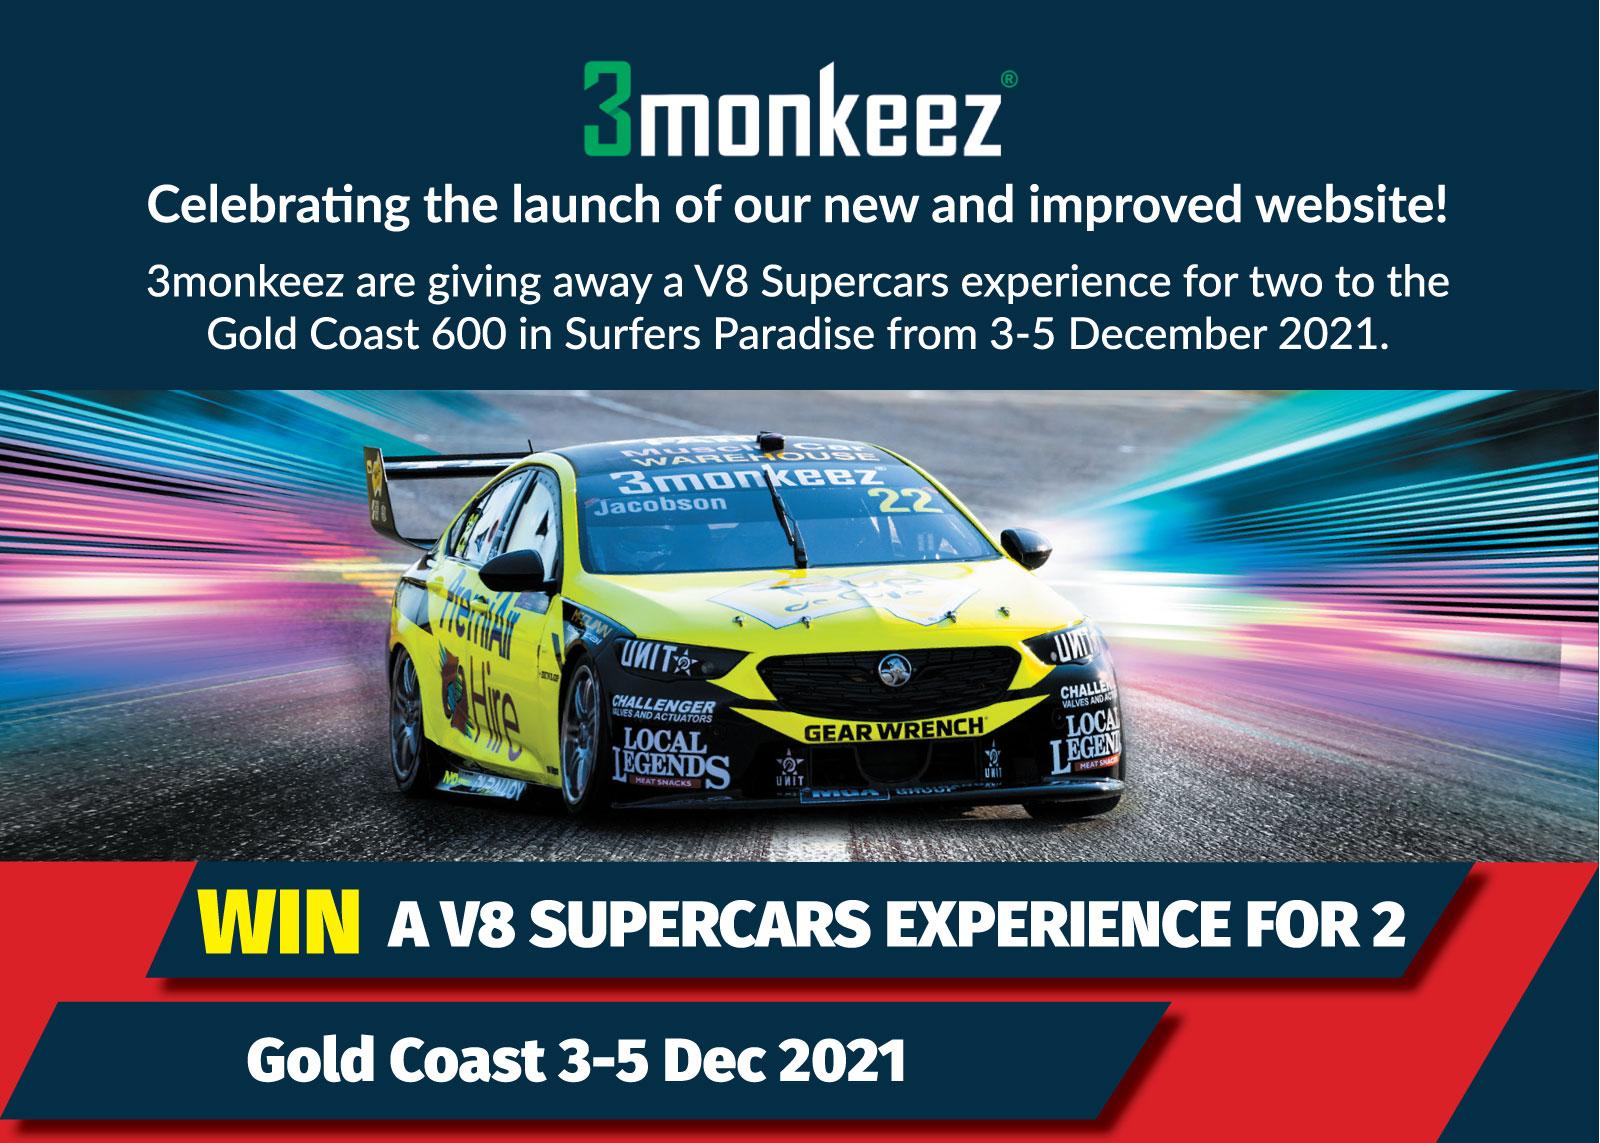 V8 Supercars Experience